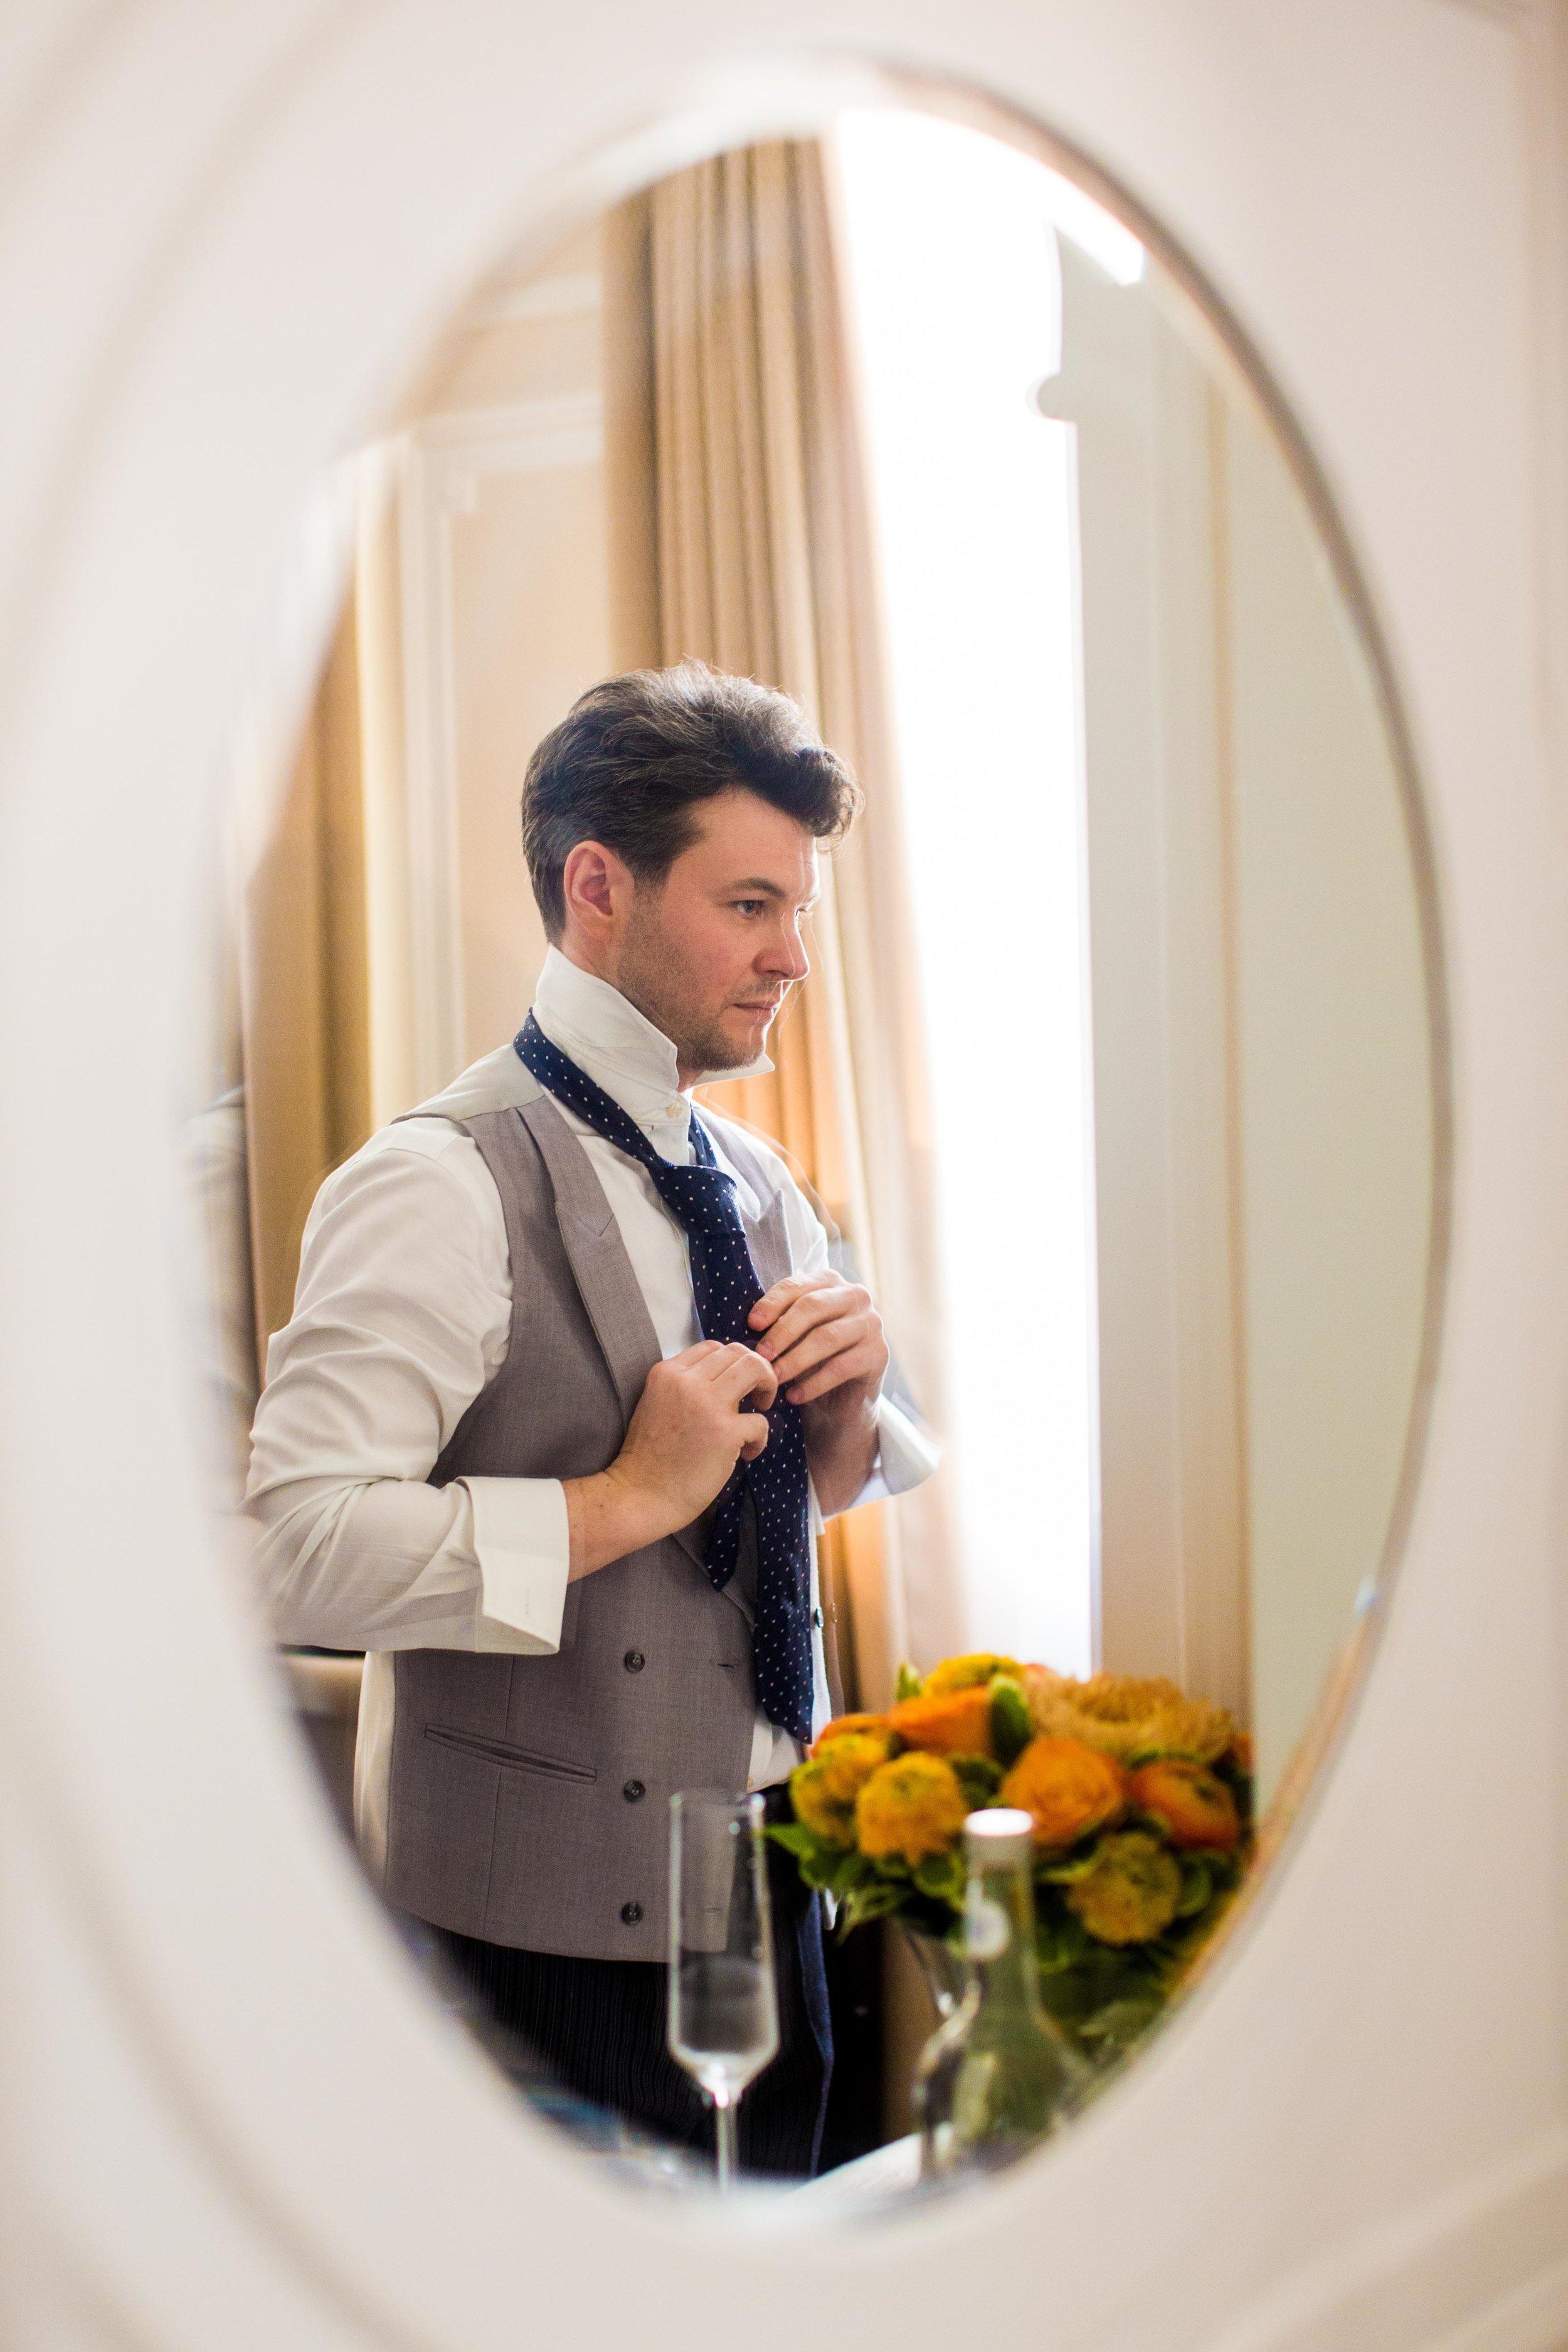 claridges-hotel-wedding-photographer-london-mayfair-natalia-smith-photography-26.jpg